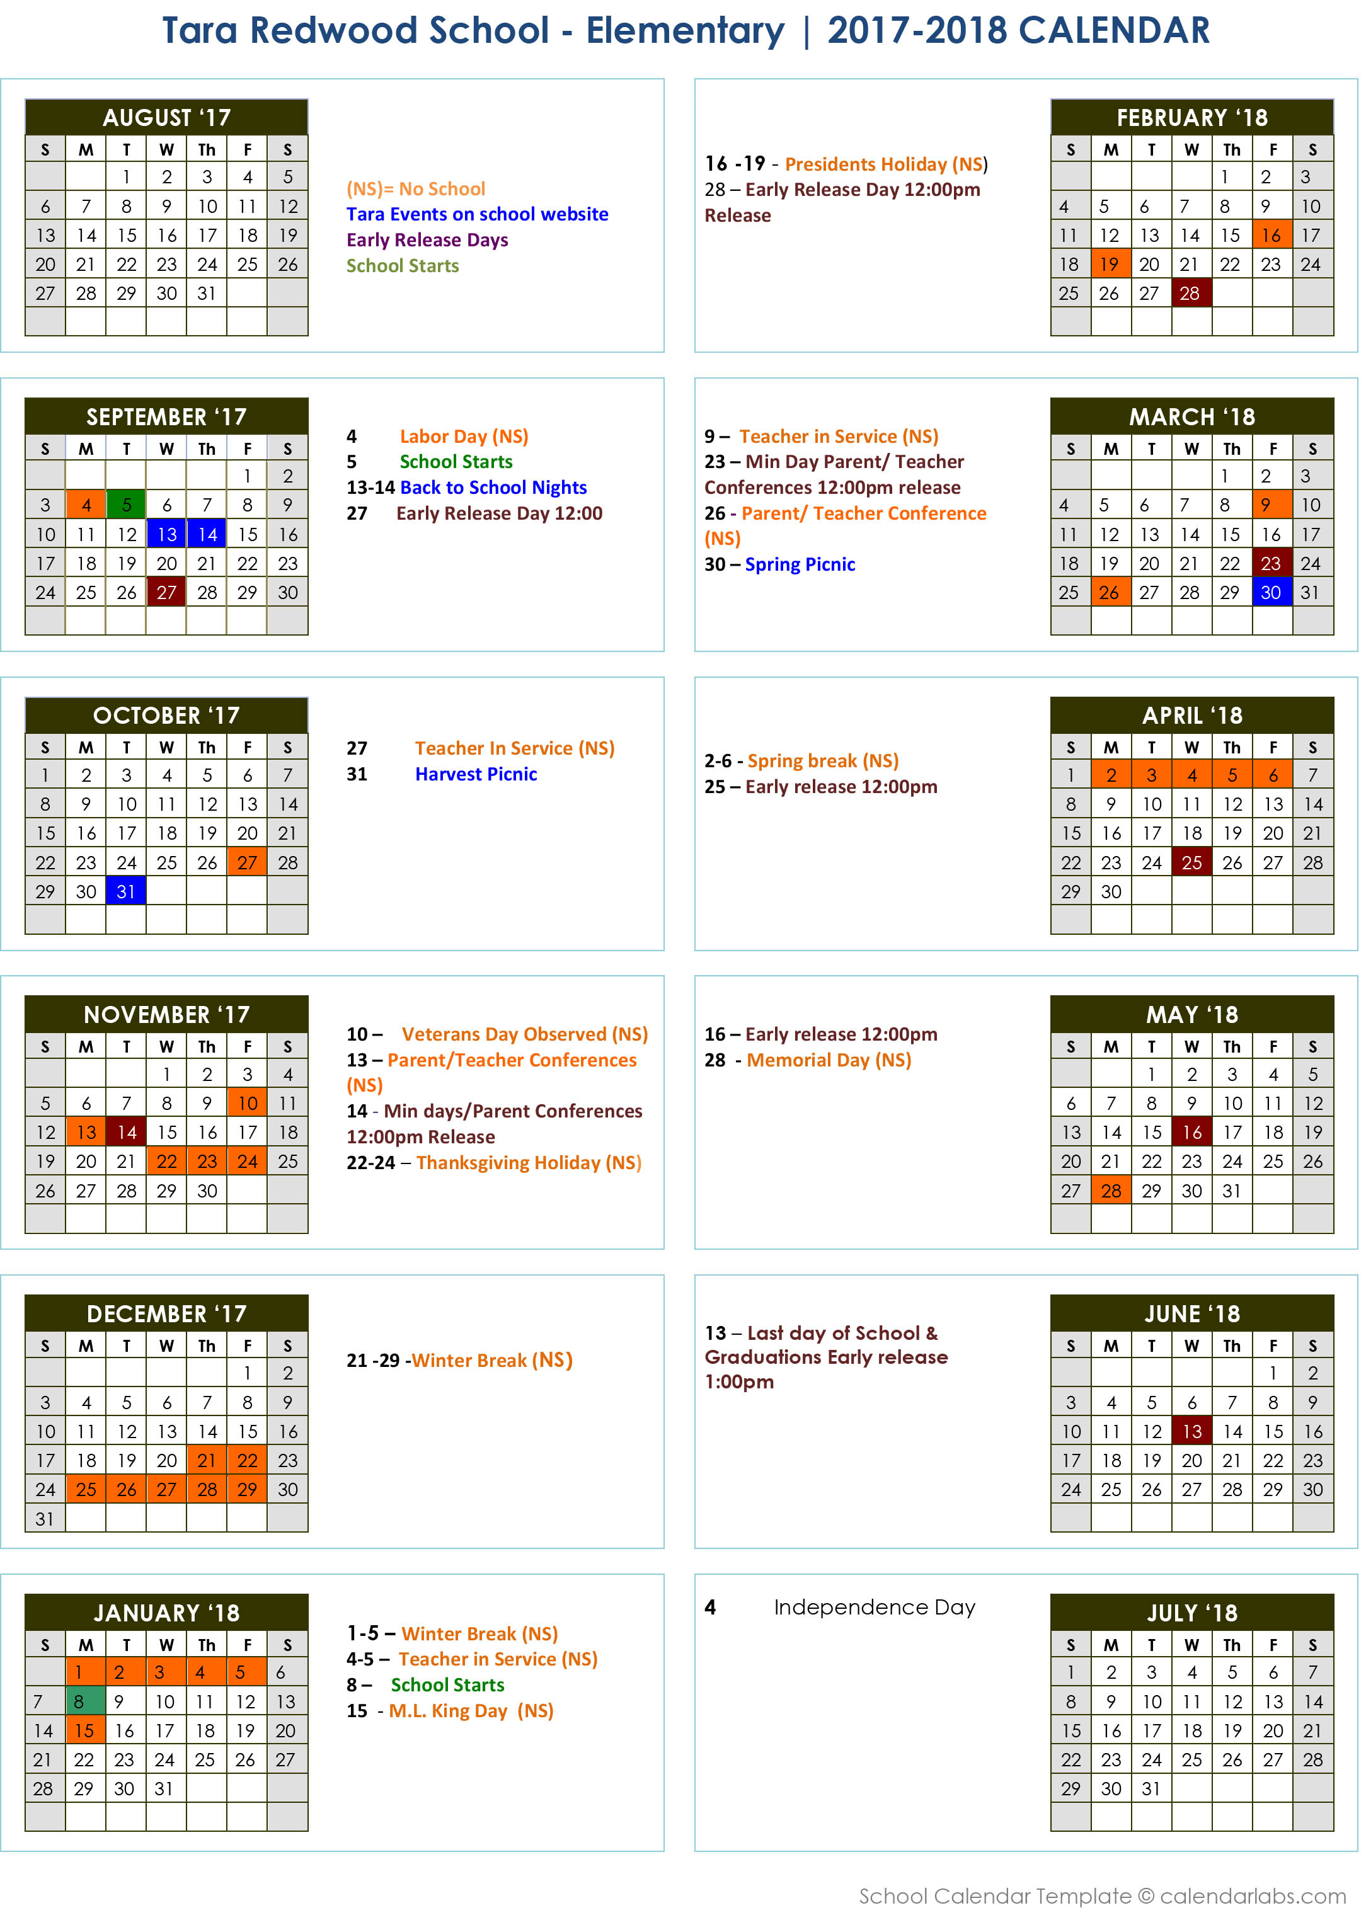 Tara Redwood School Elementary School Calendar